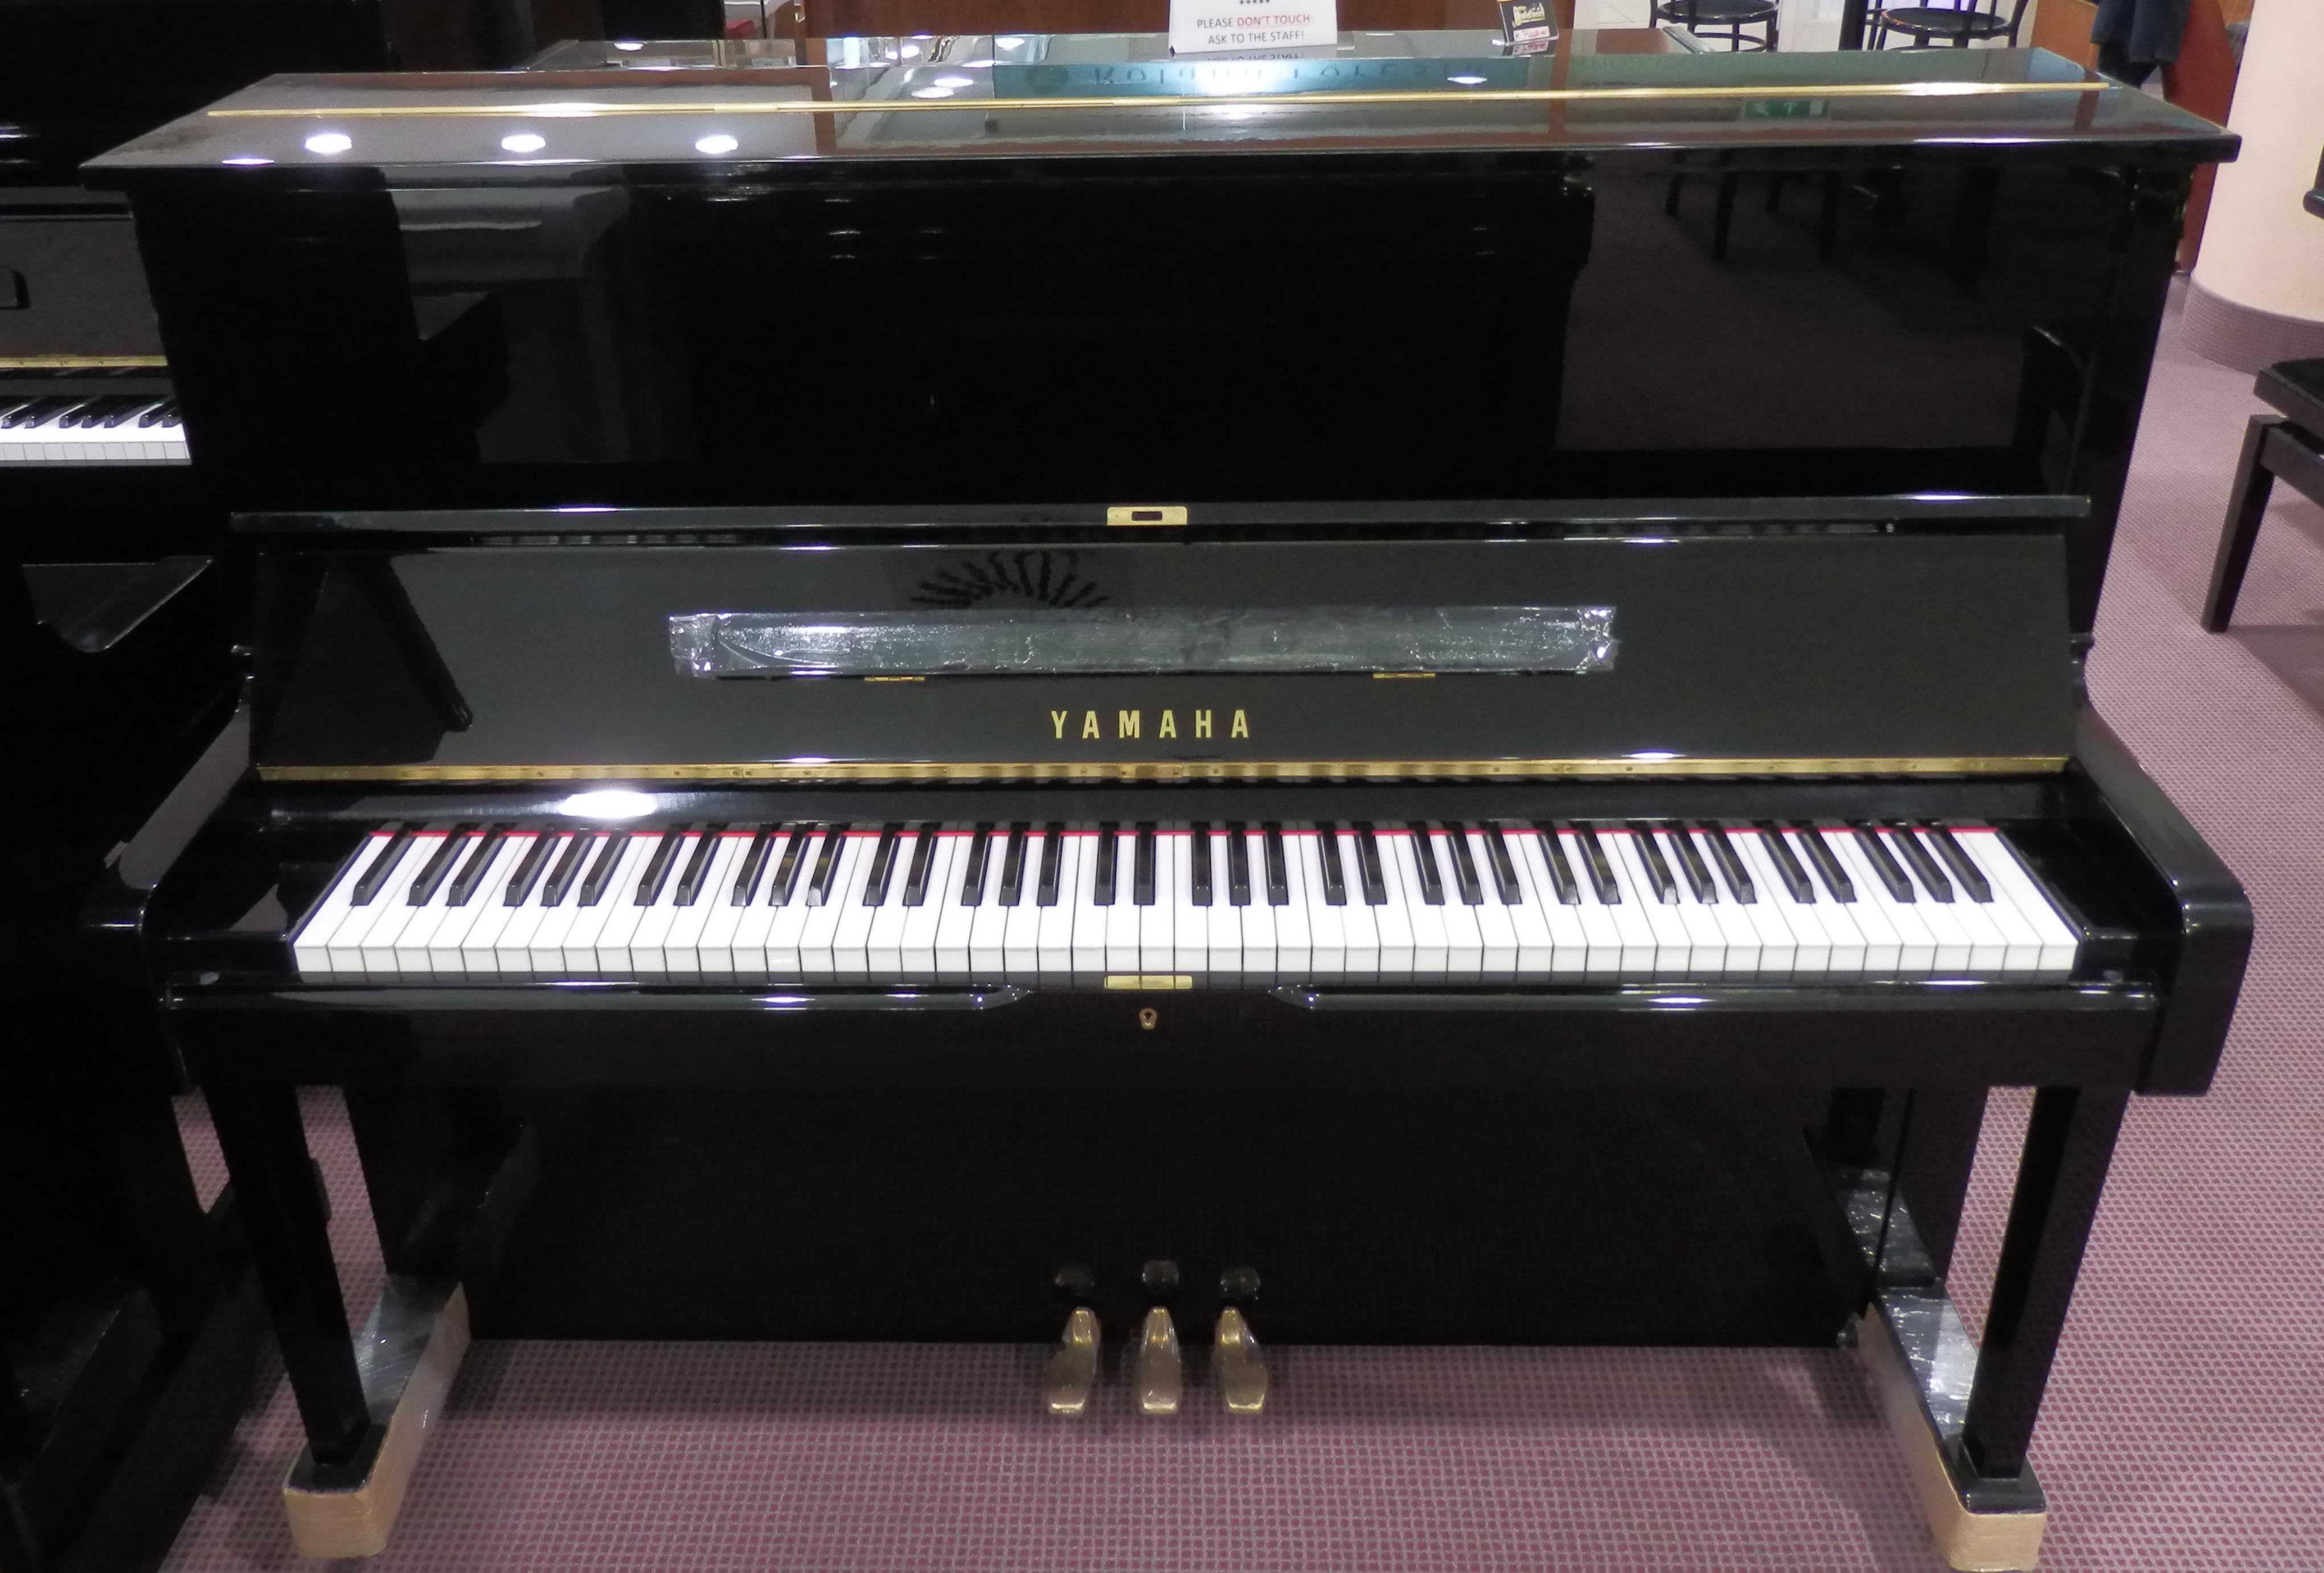 Yamaha U1 pianoforte verticale usato nero - Strumenti ...